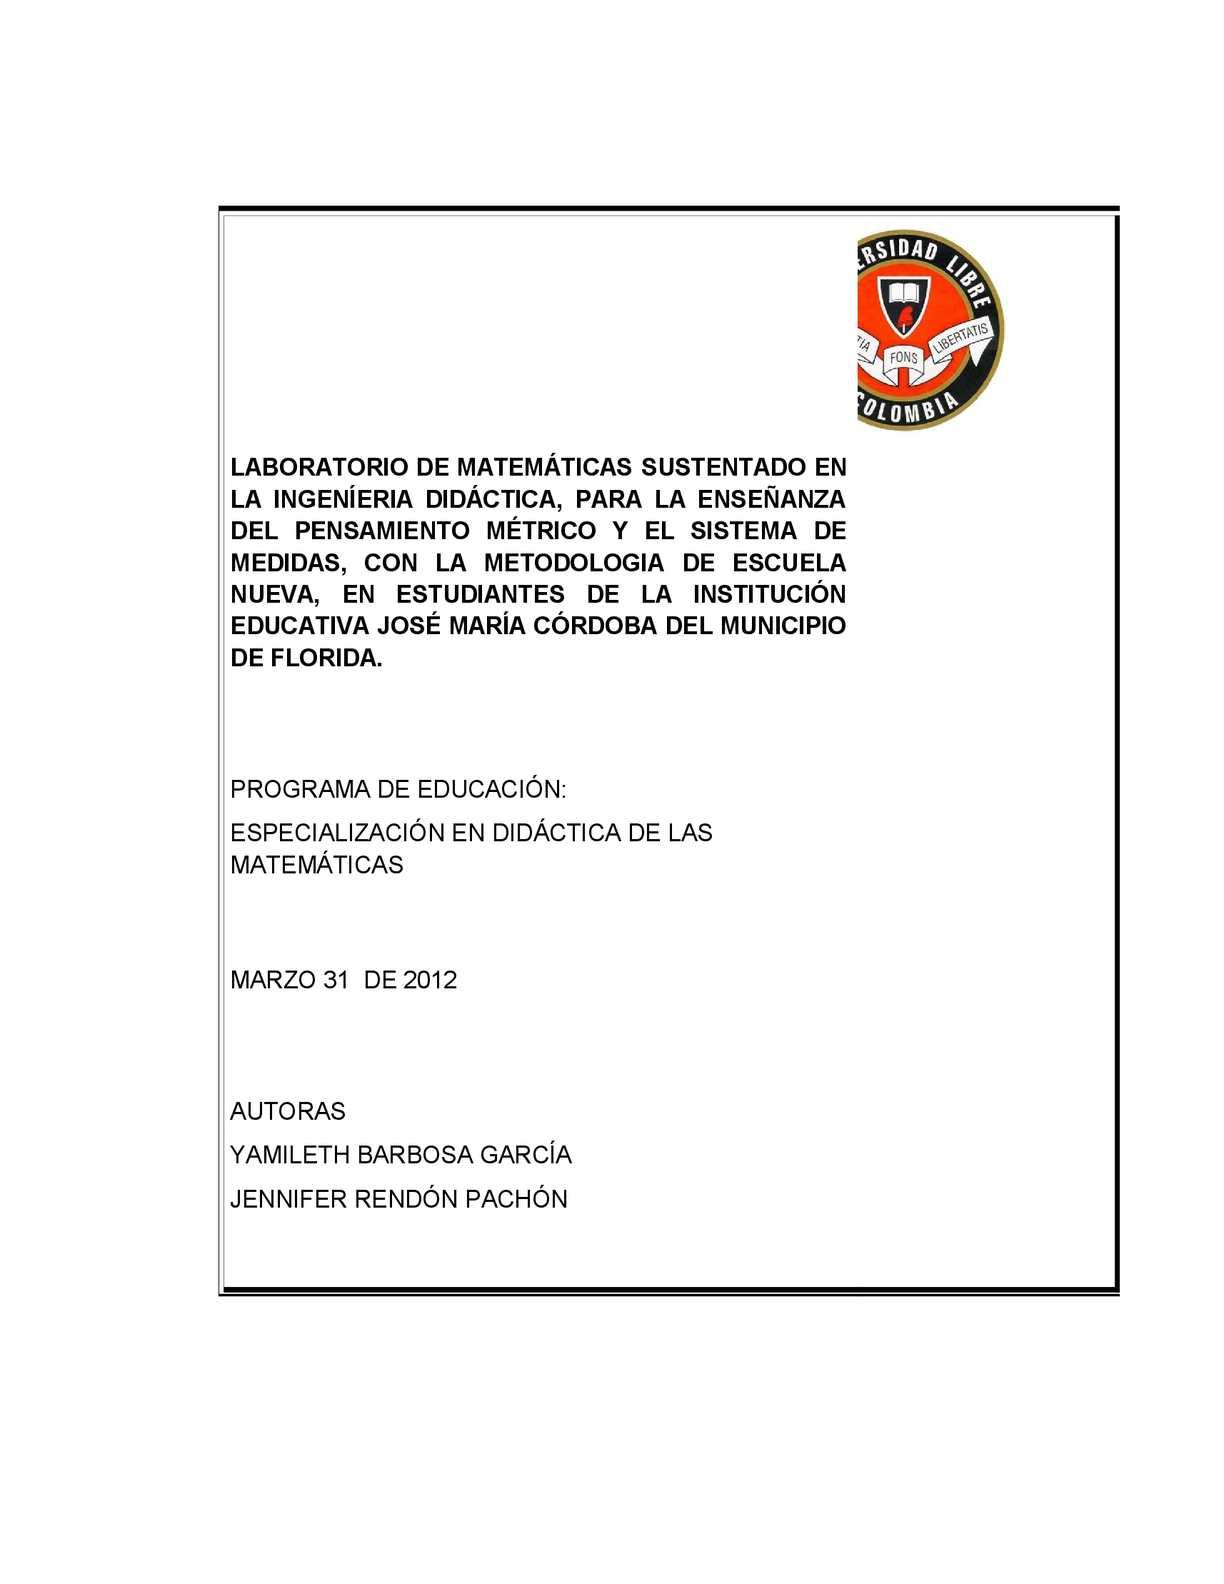 Calaméo - TESIS: LABORATORIO DE MATEMÁTICAS